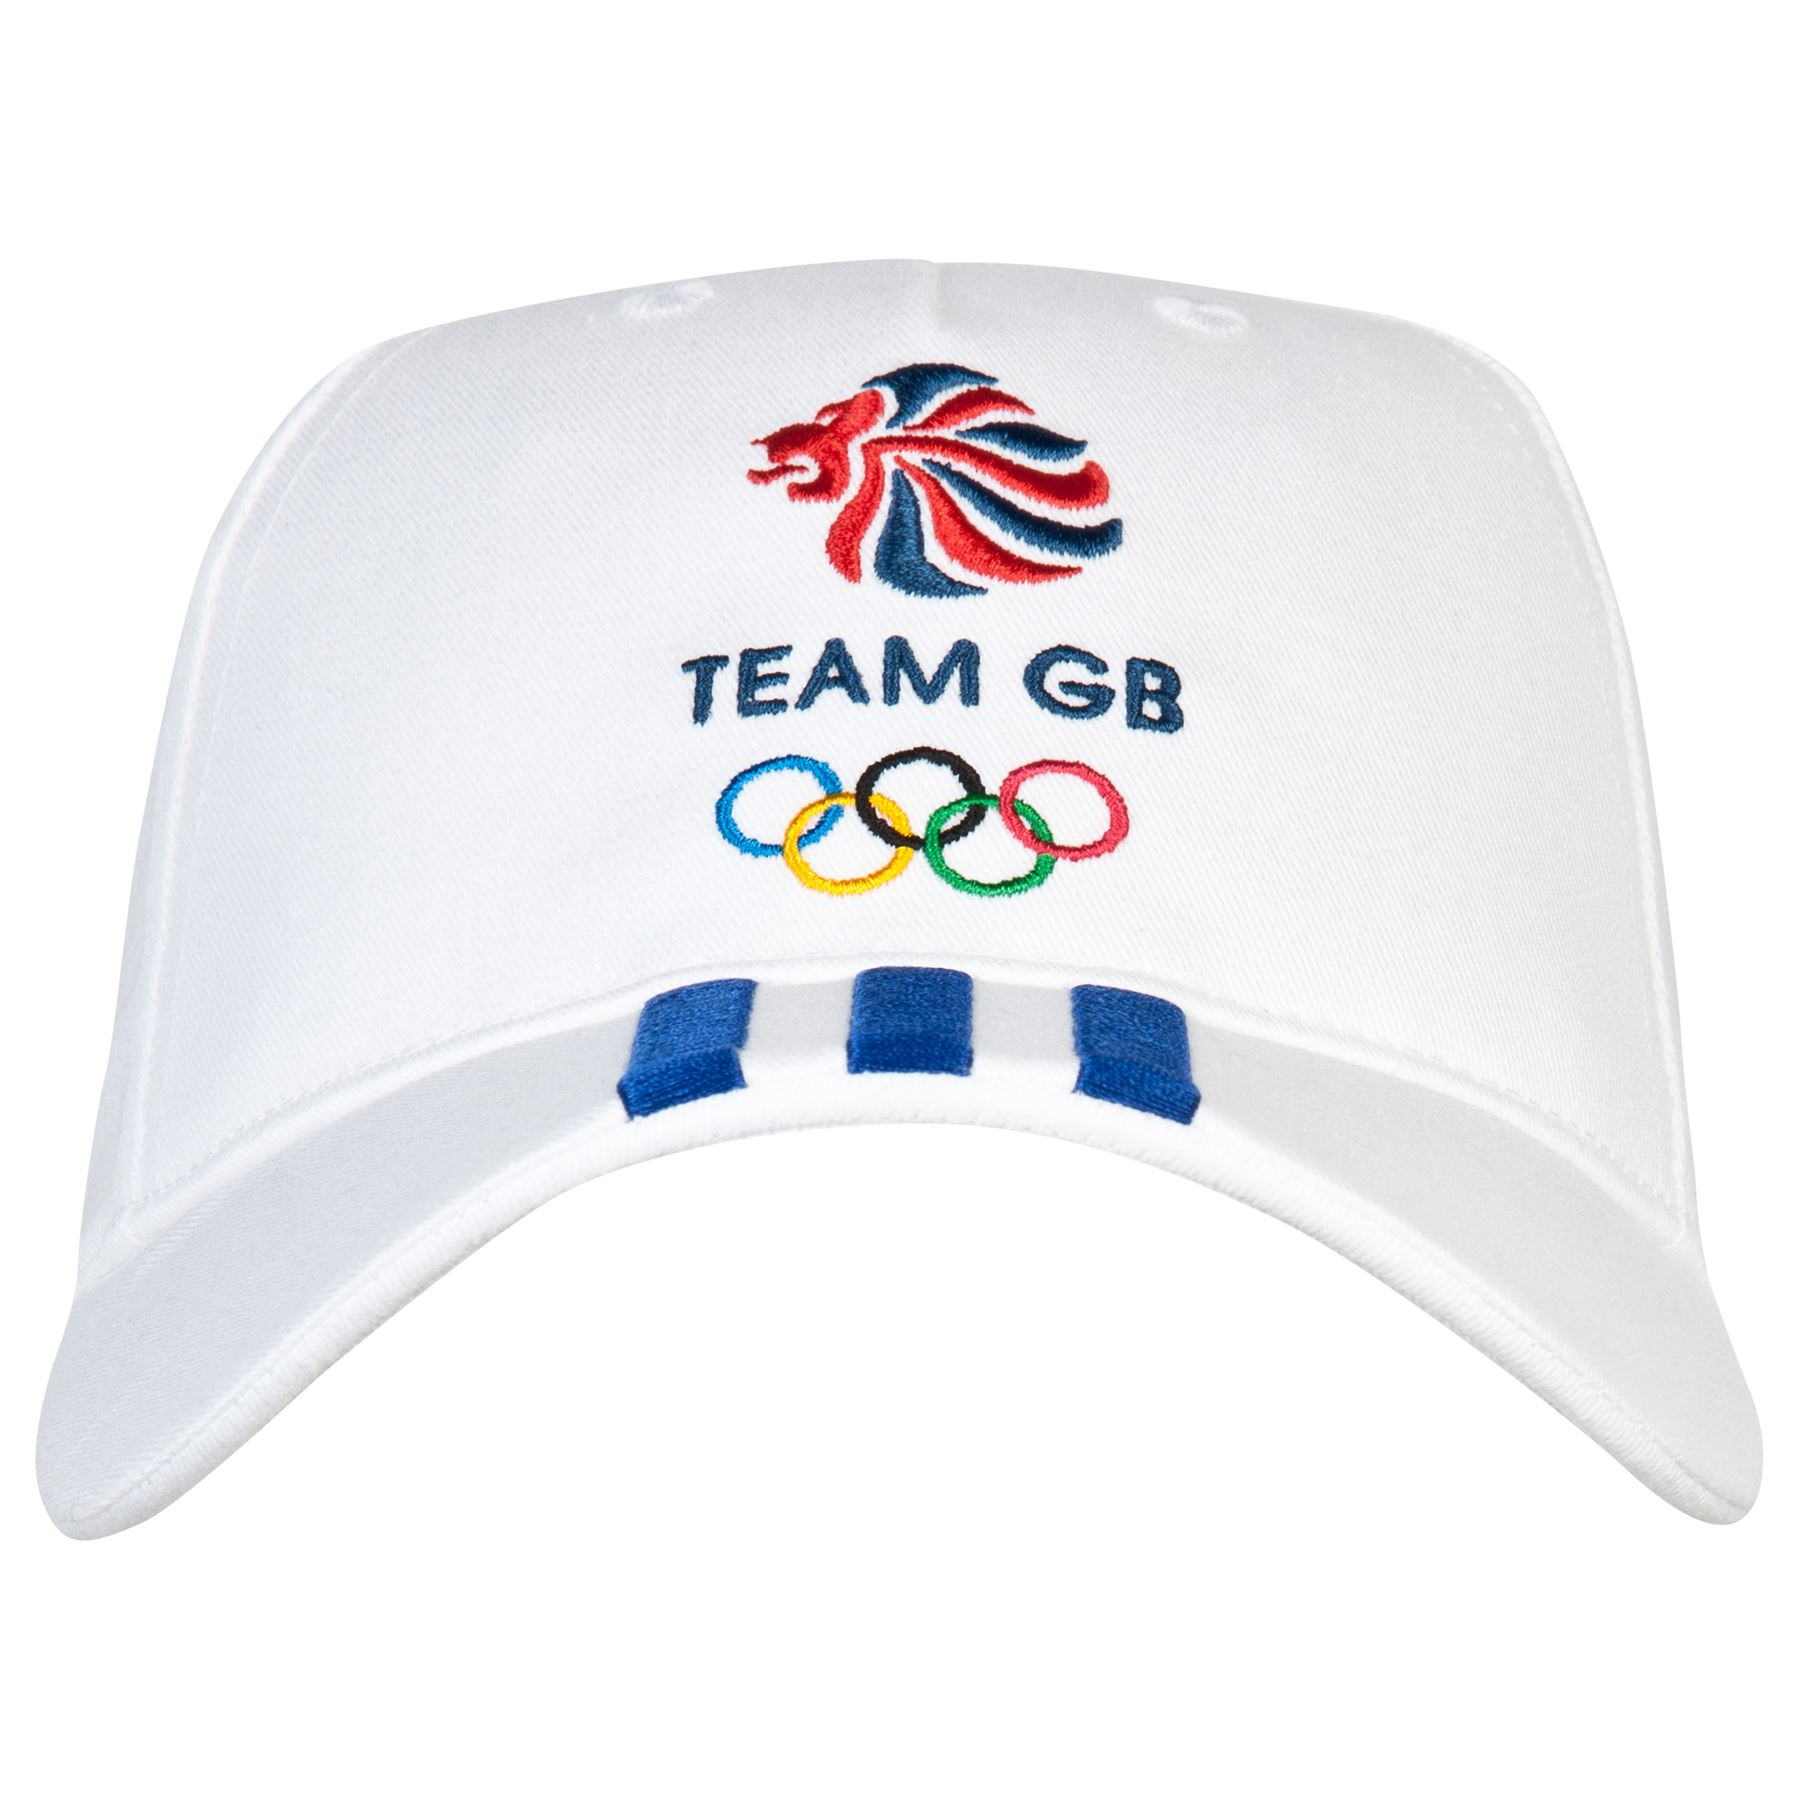 adidas Unisex Team GB Big Logo Sports Cap Hat - White ...